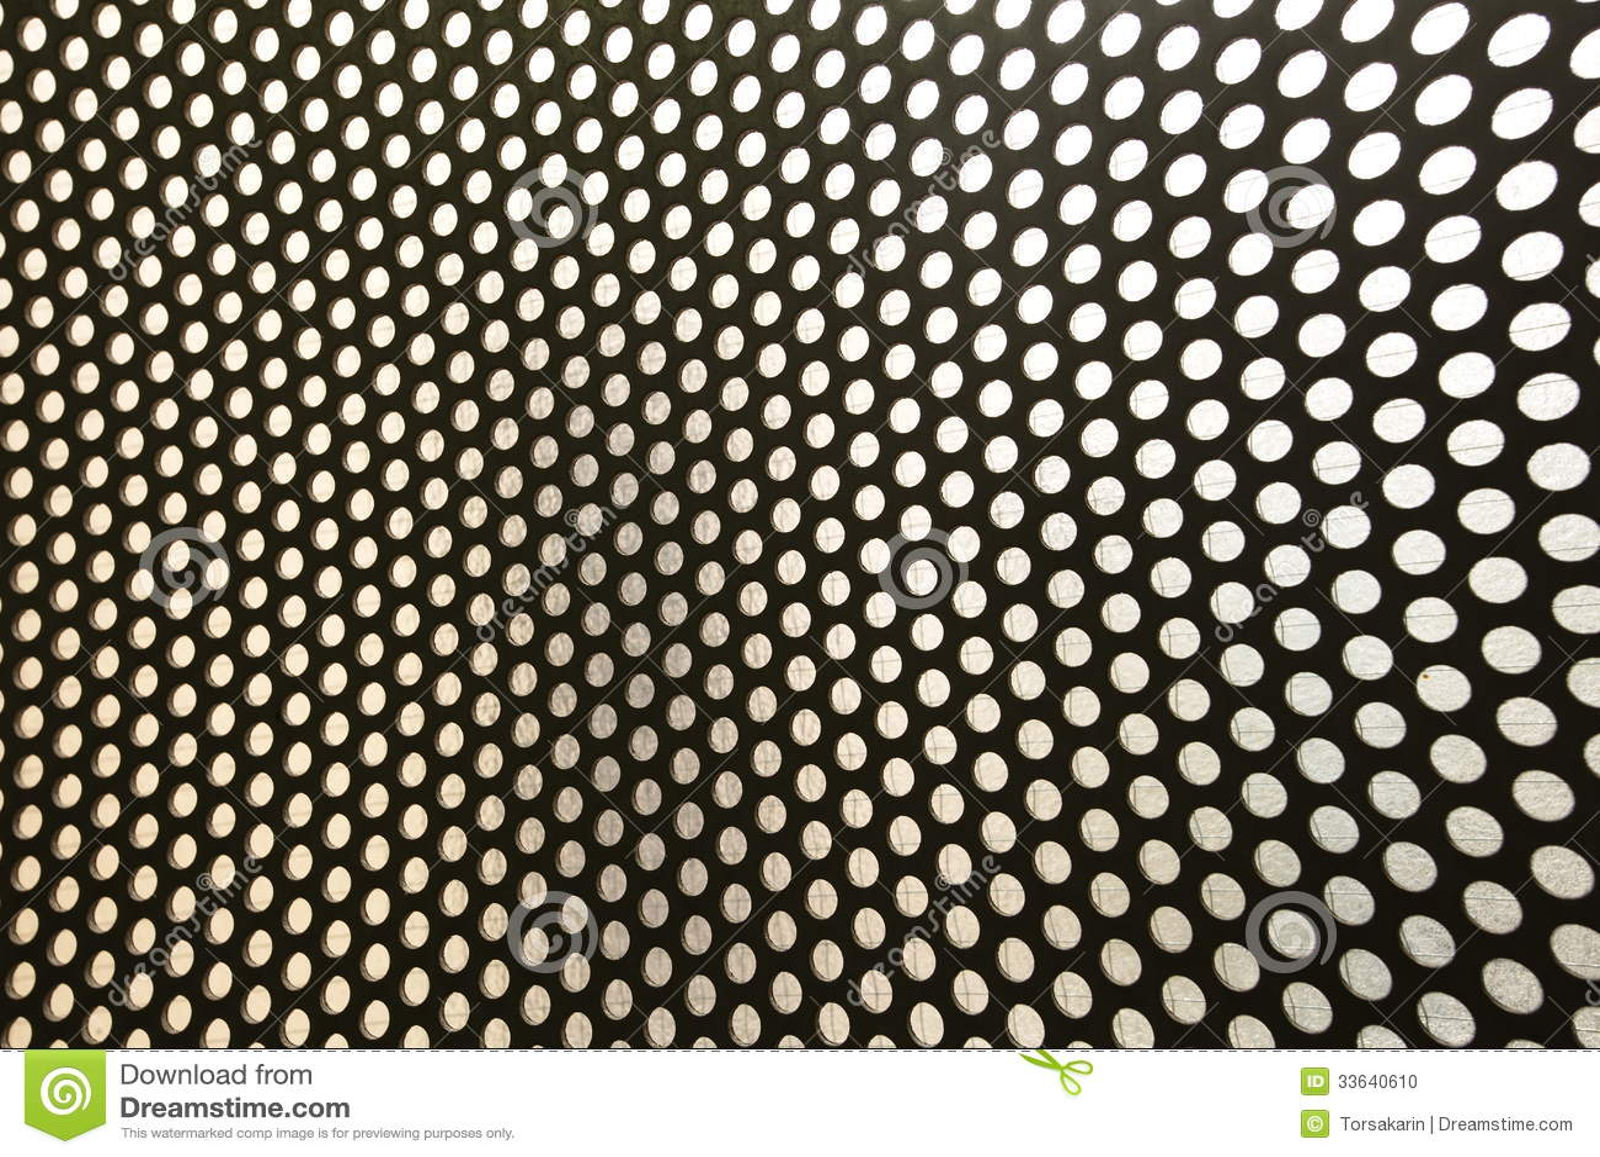 chrome metal background - photo #34